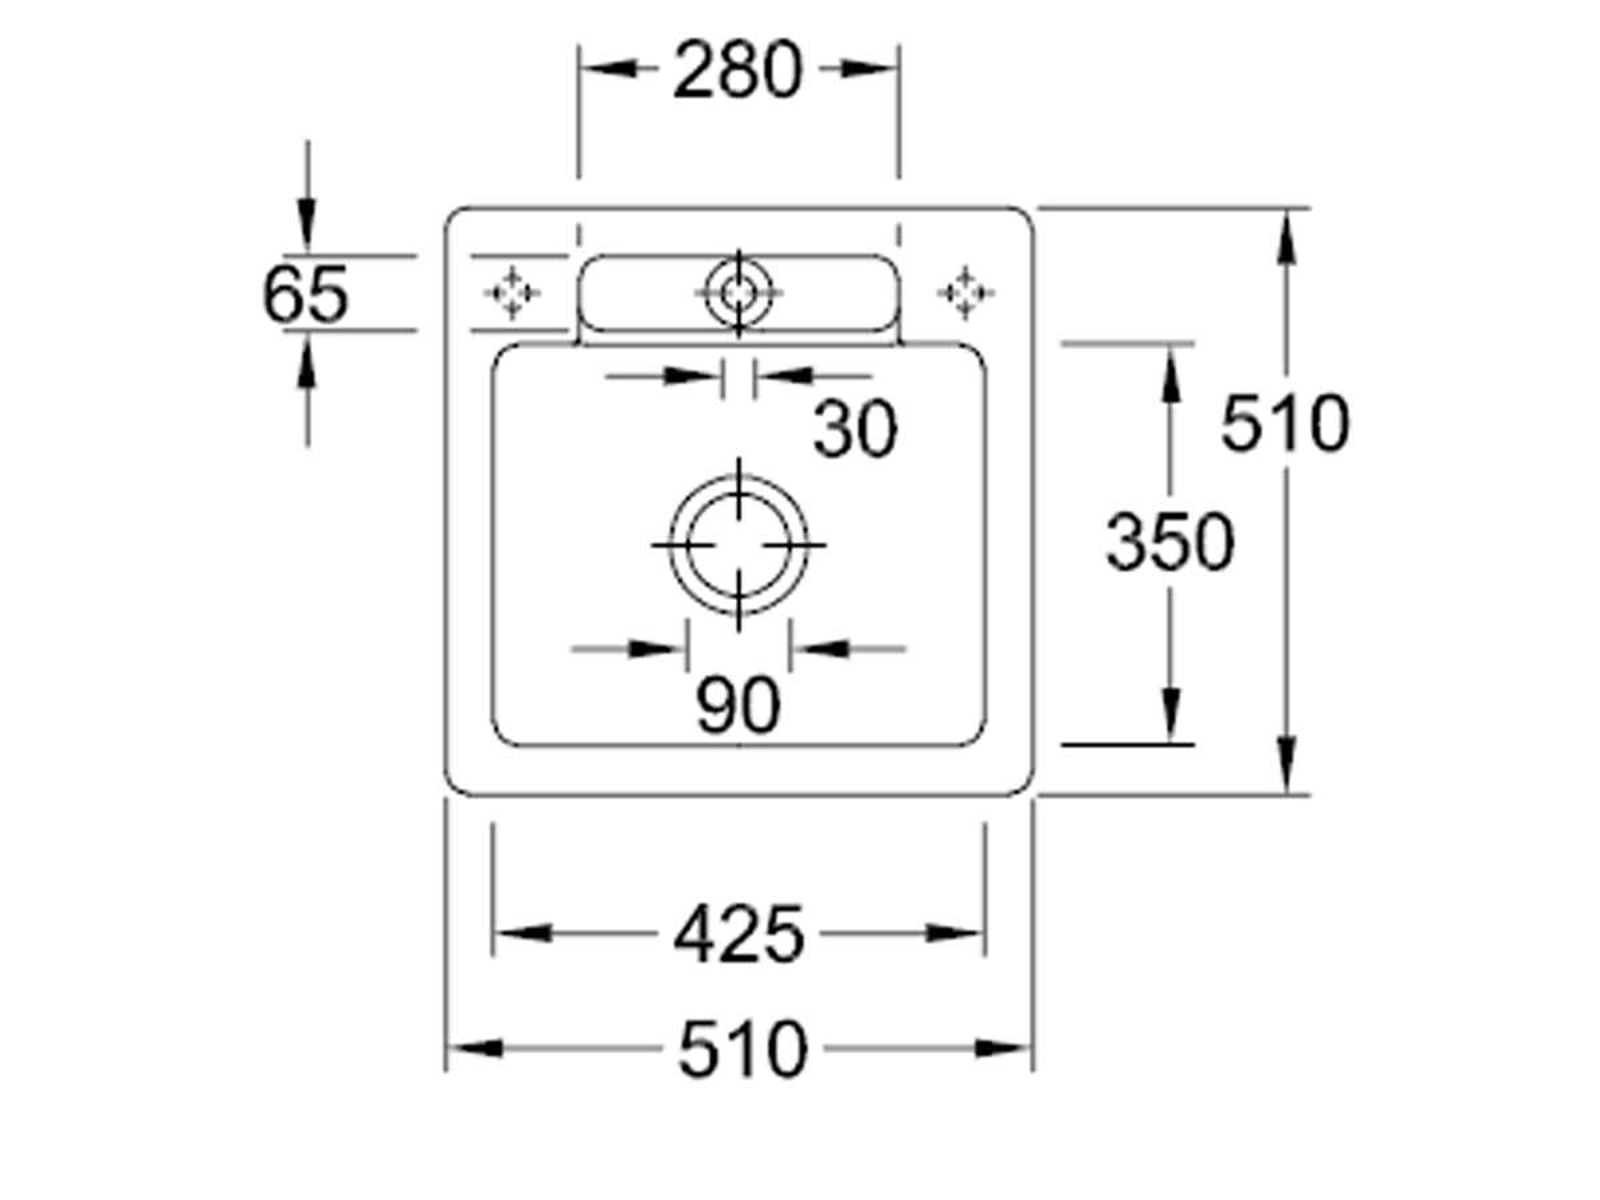 Villeroy & Boch Siluet 50 S Almond  – 3345 01 AM Keramikspüle Handbetätigung